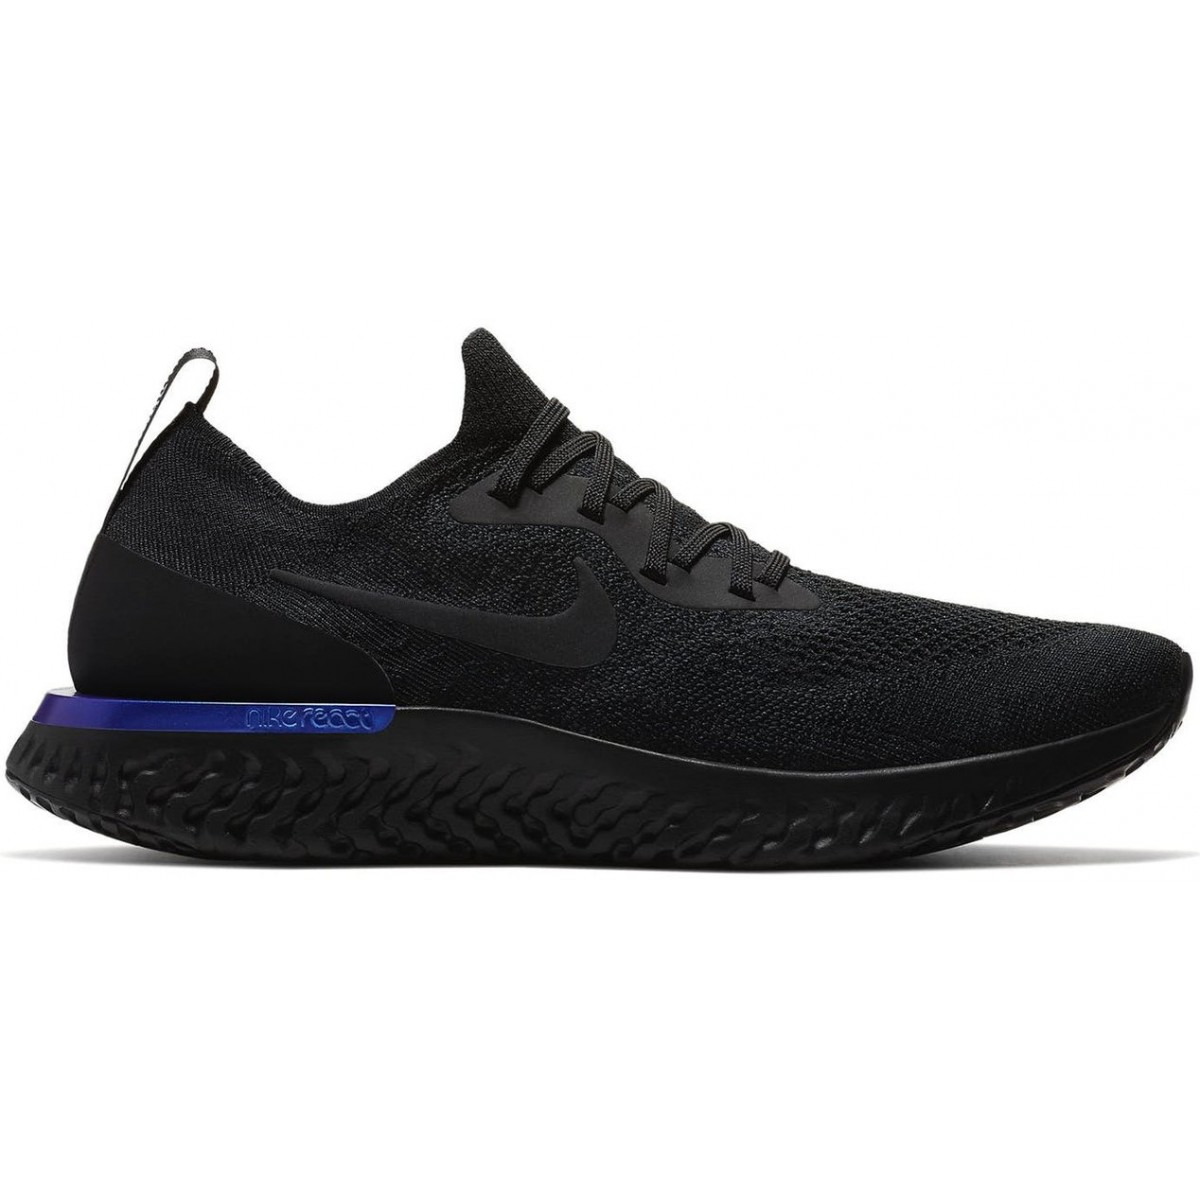 Nike Epic React Flyknit 'Black' AQ0067-003